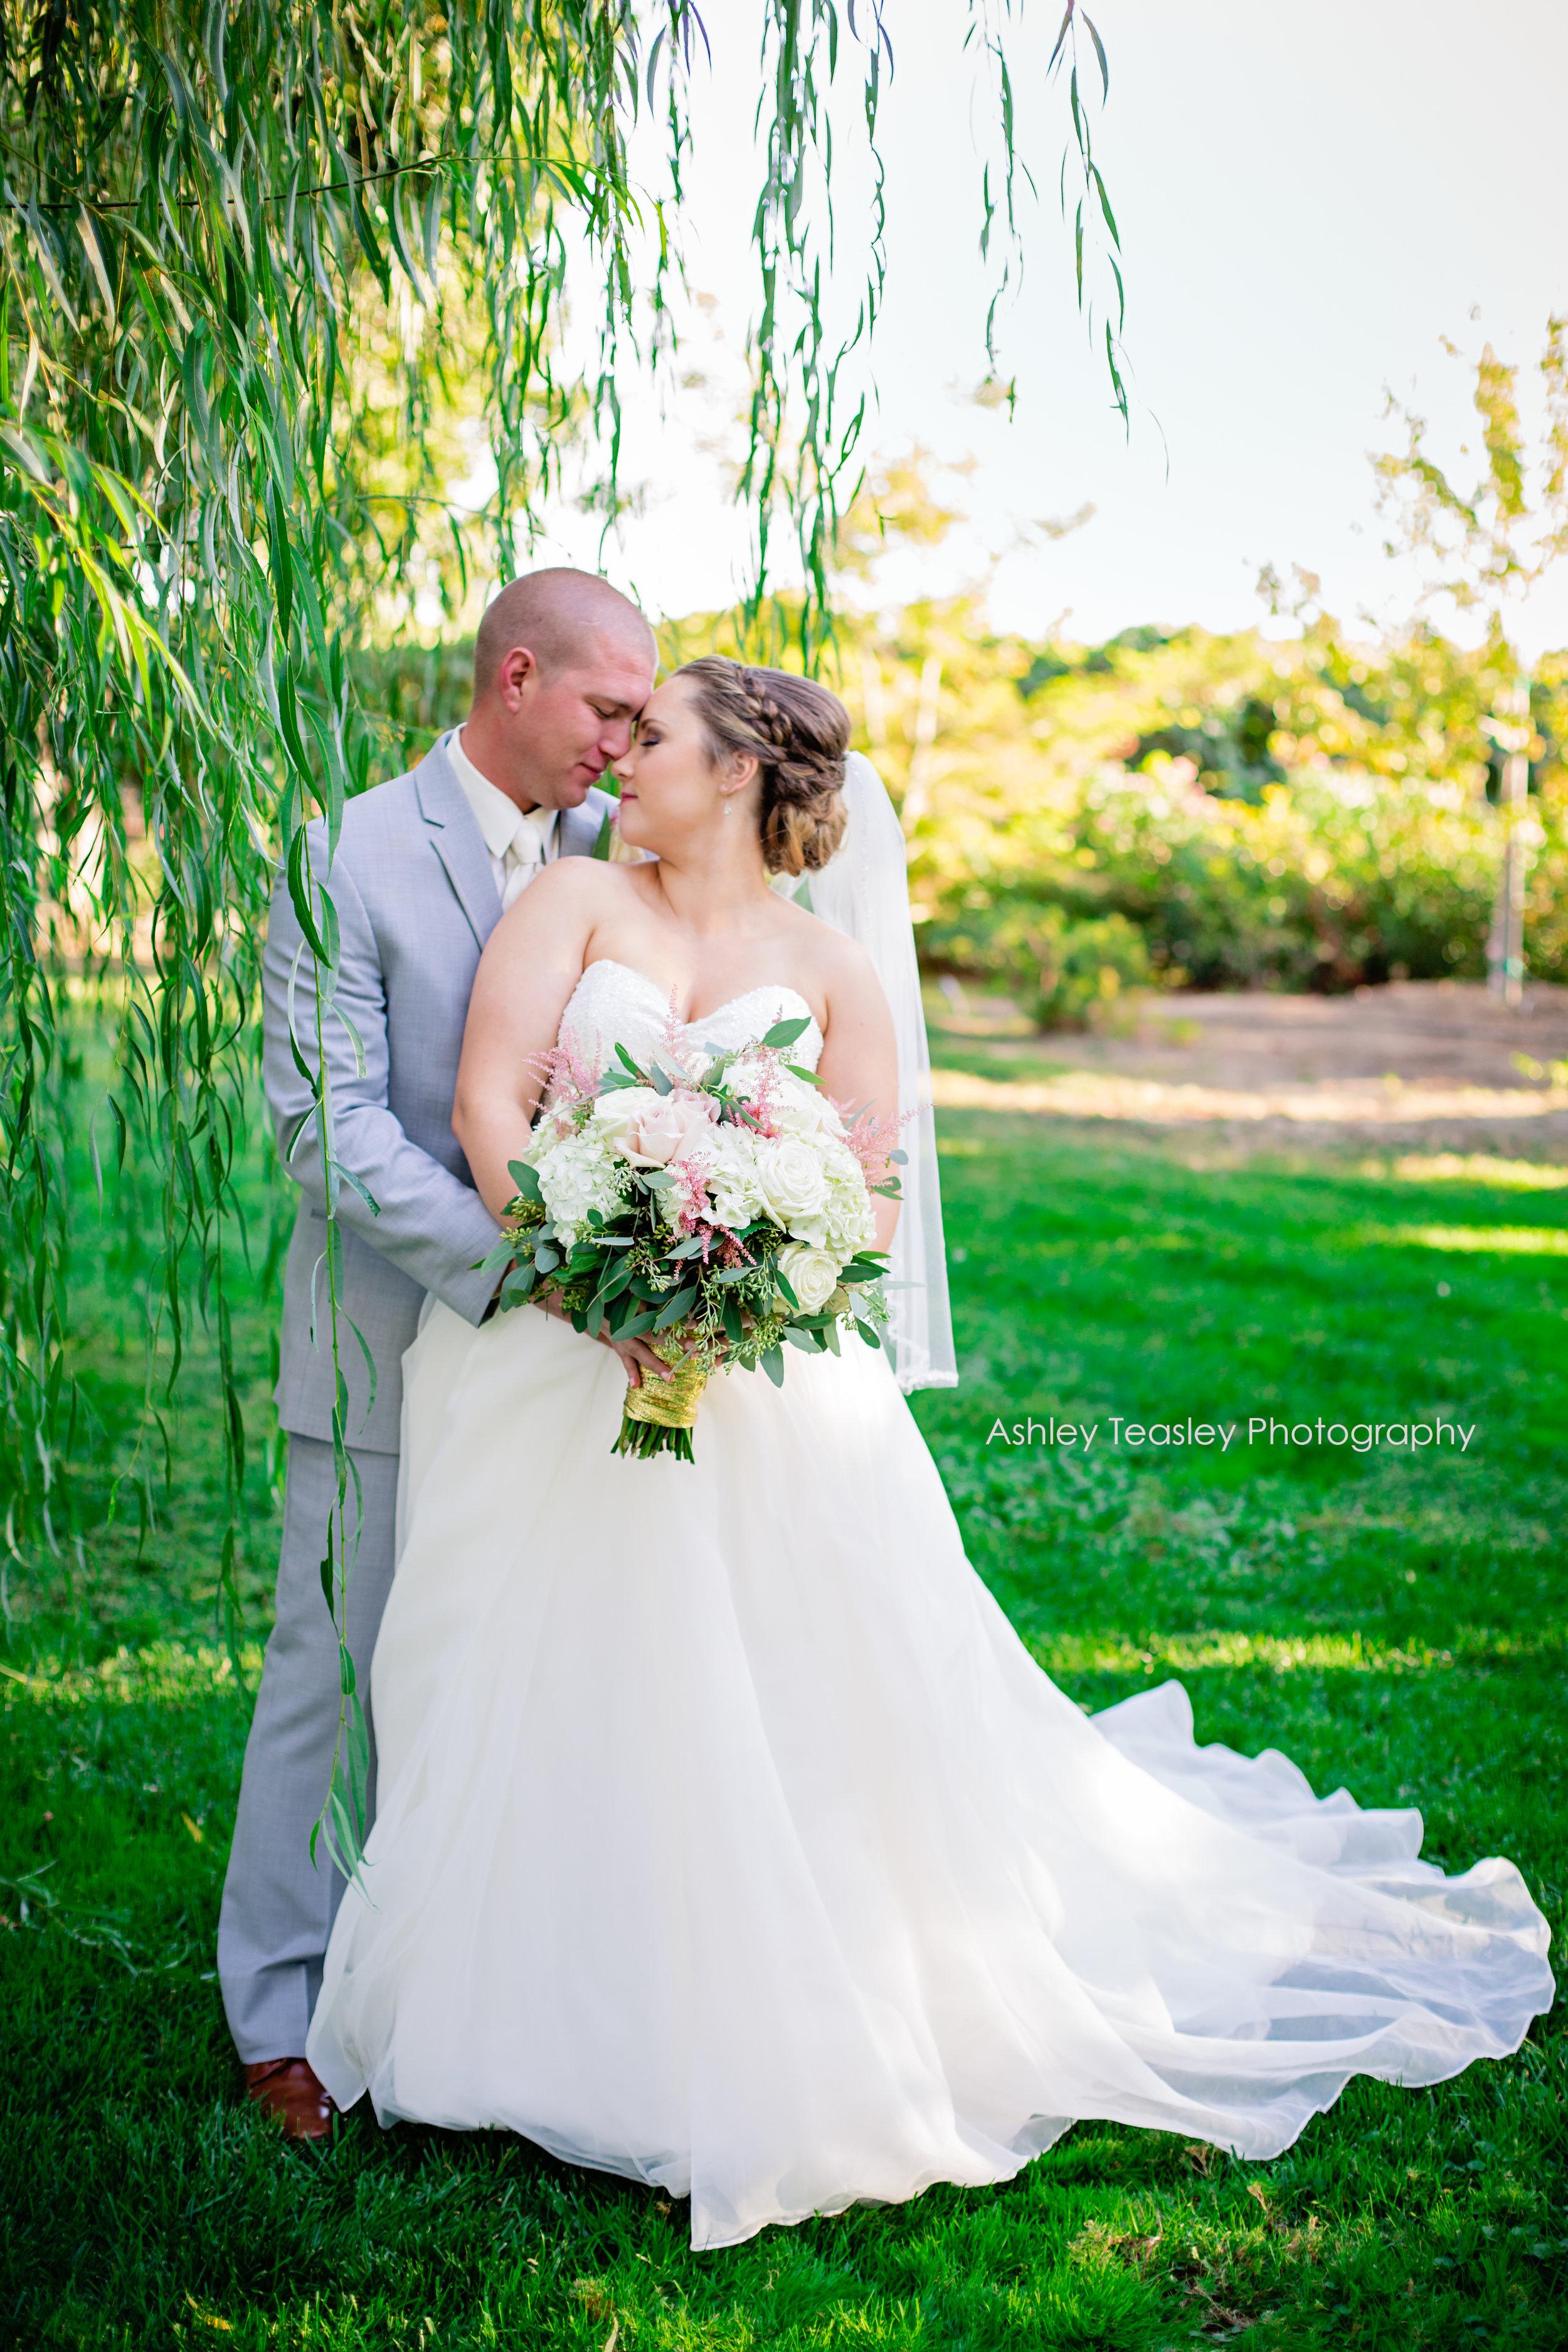 Jamie & Luke - Mettler Family Vineyards - Lodi - sacramento wedding photographer - ashley teasley photography-.JPG